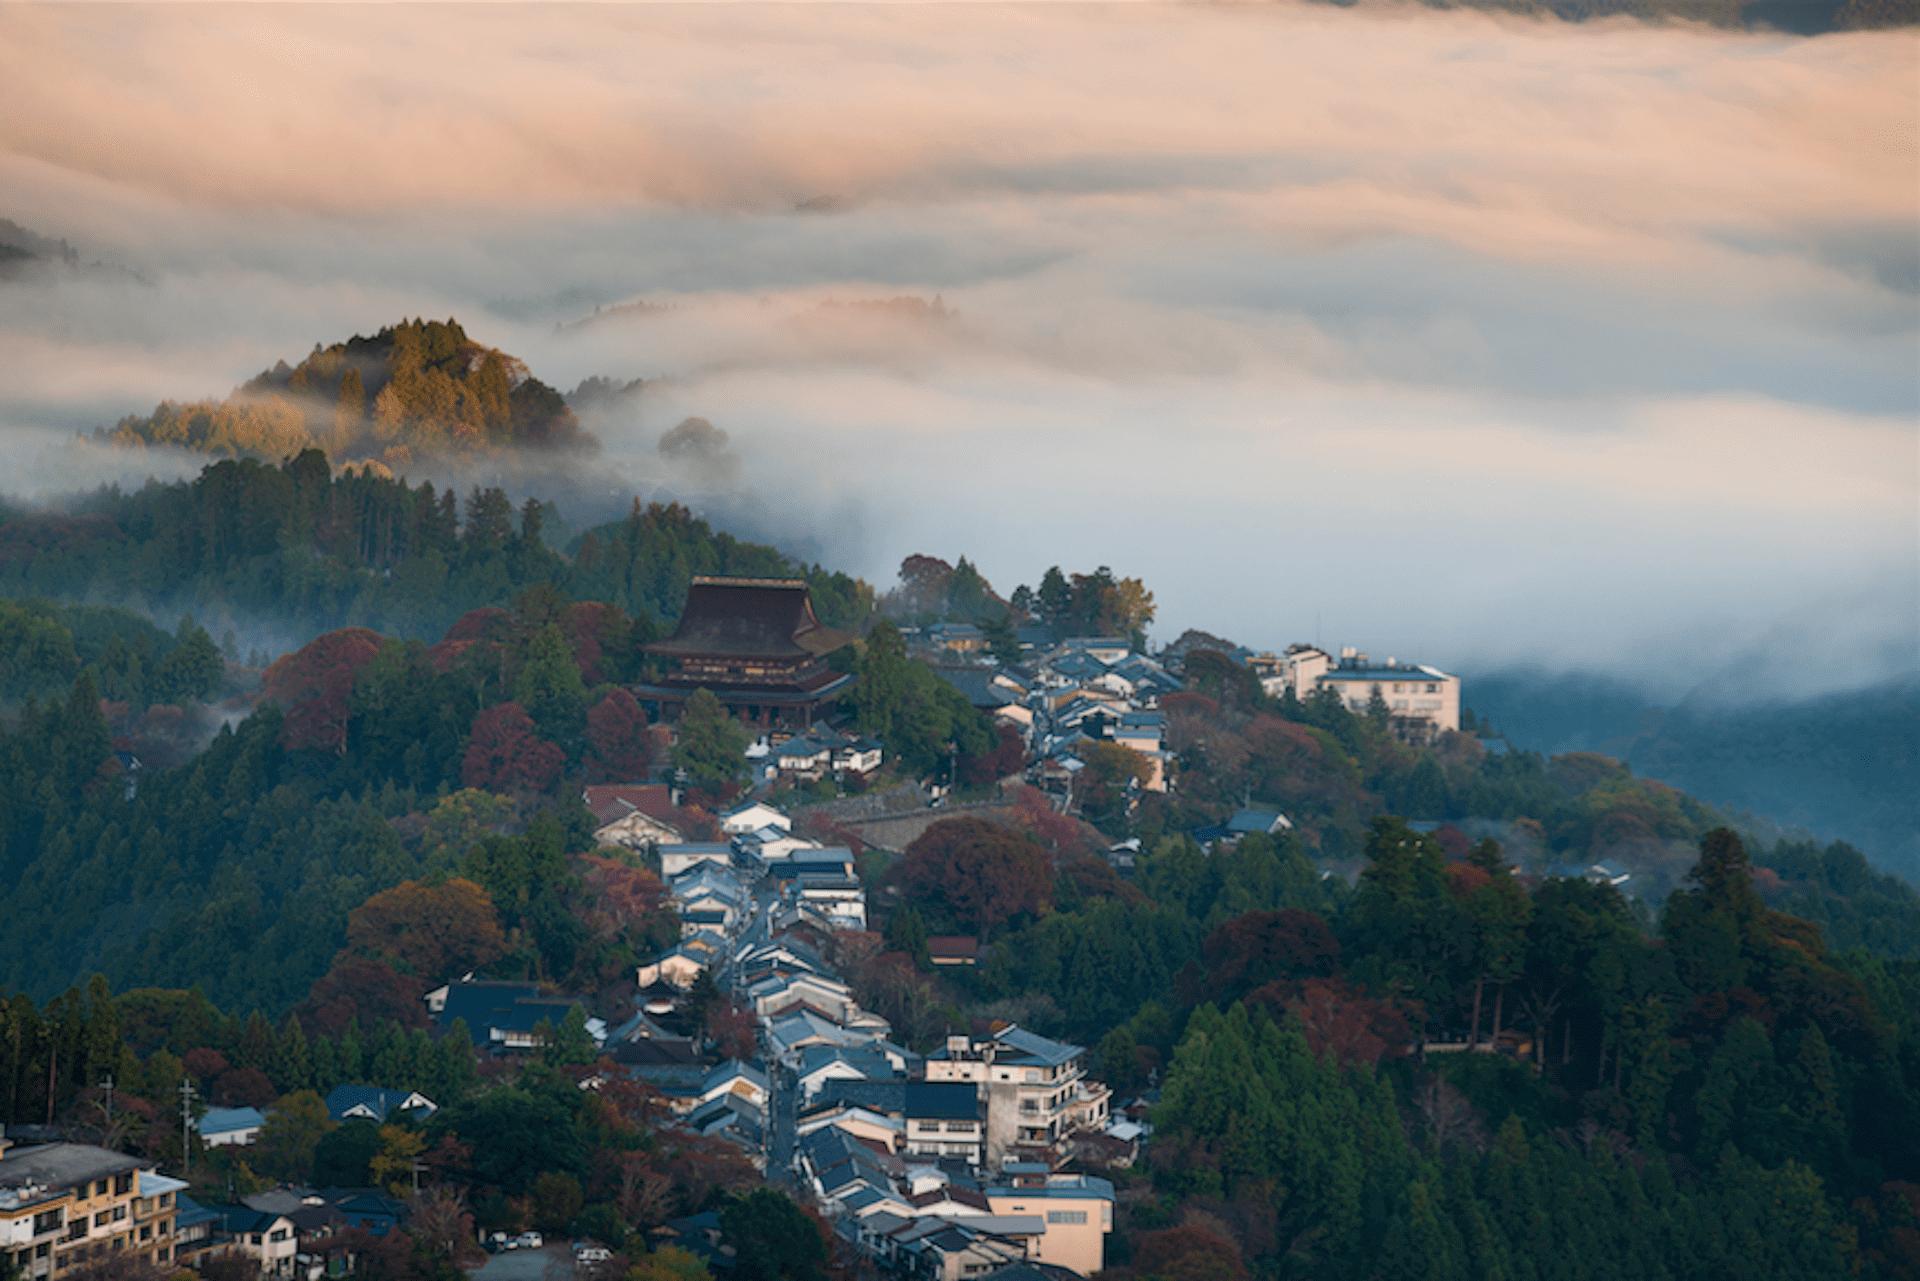 sub4-1-1920x1281 開催間近!奈良の自然に包まれた芸術祭、ライゾマ齋藤精一がプロデュースする<MIND TRAIL 奥大和 心のなかの美術館>